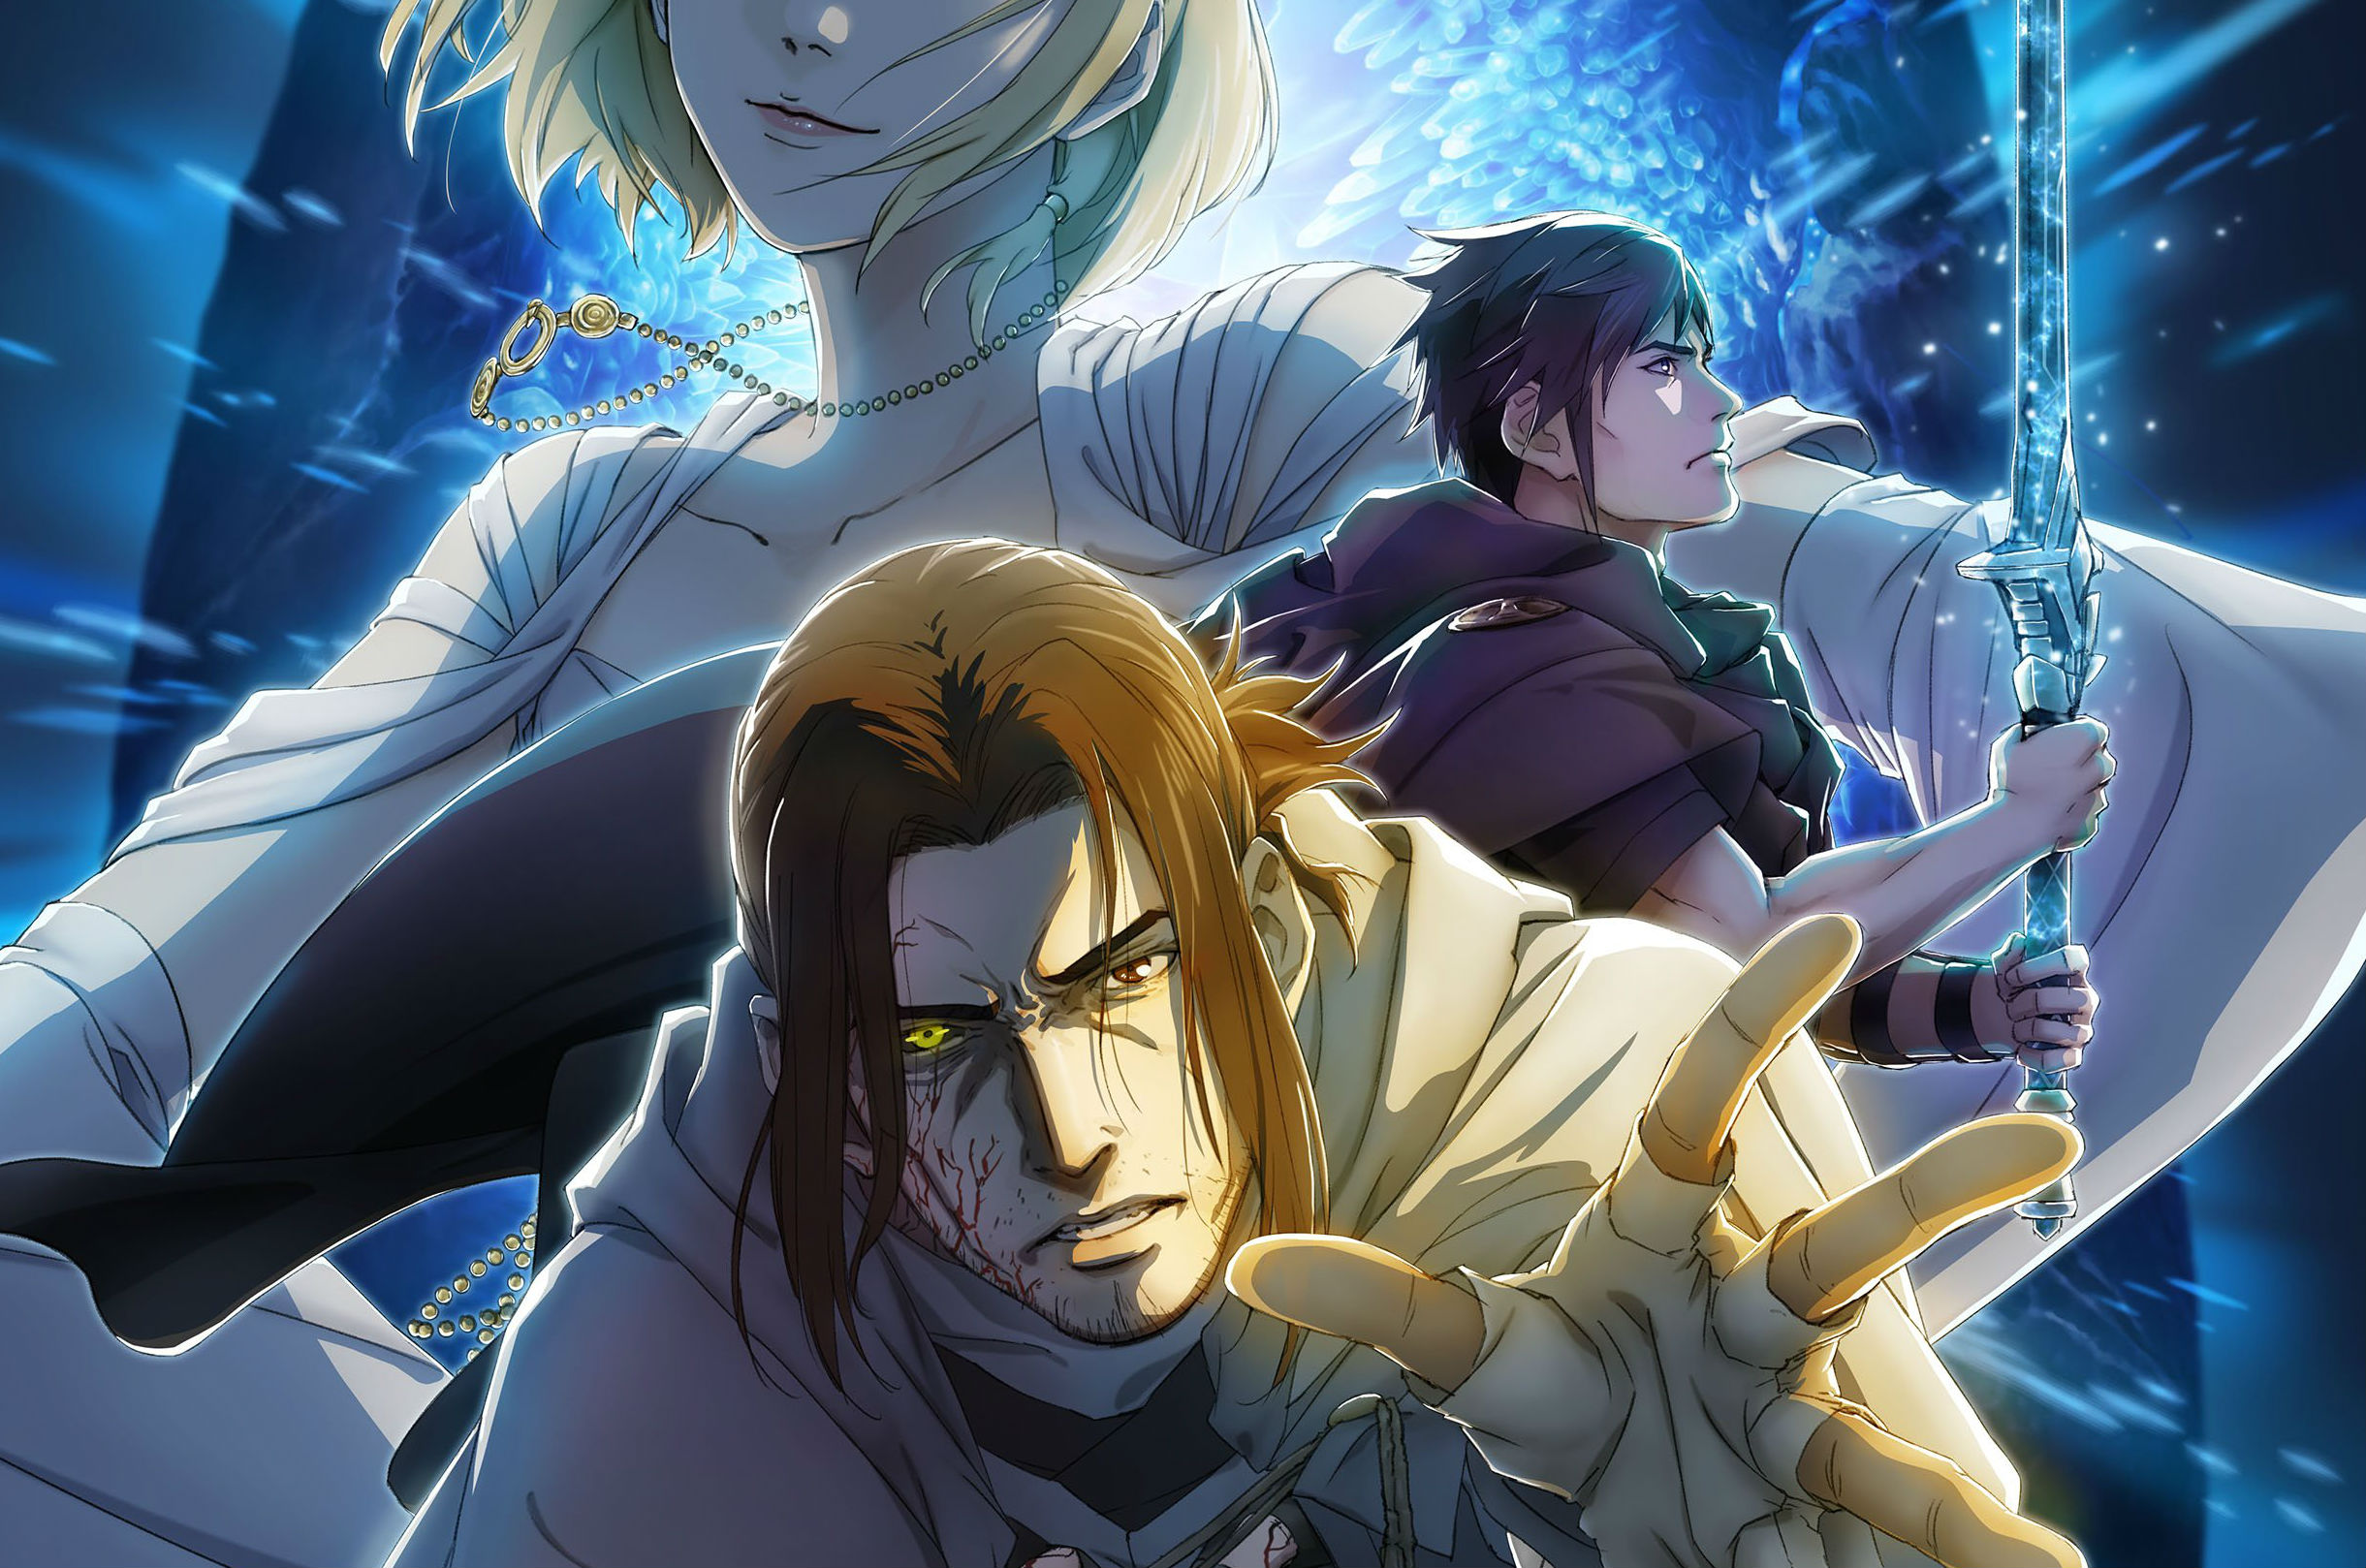 Final Fantasy XV's last DLC gets a killer piece of anime promo art screenshot